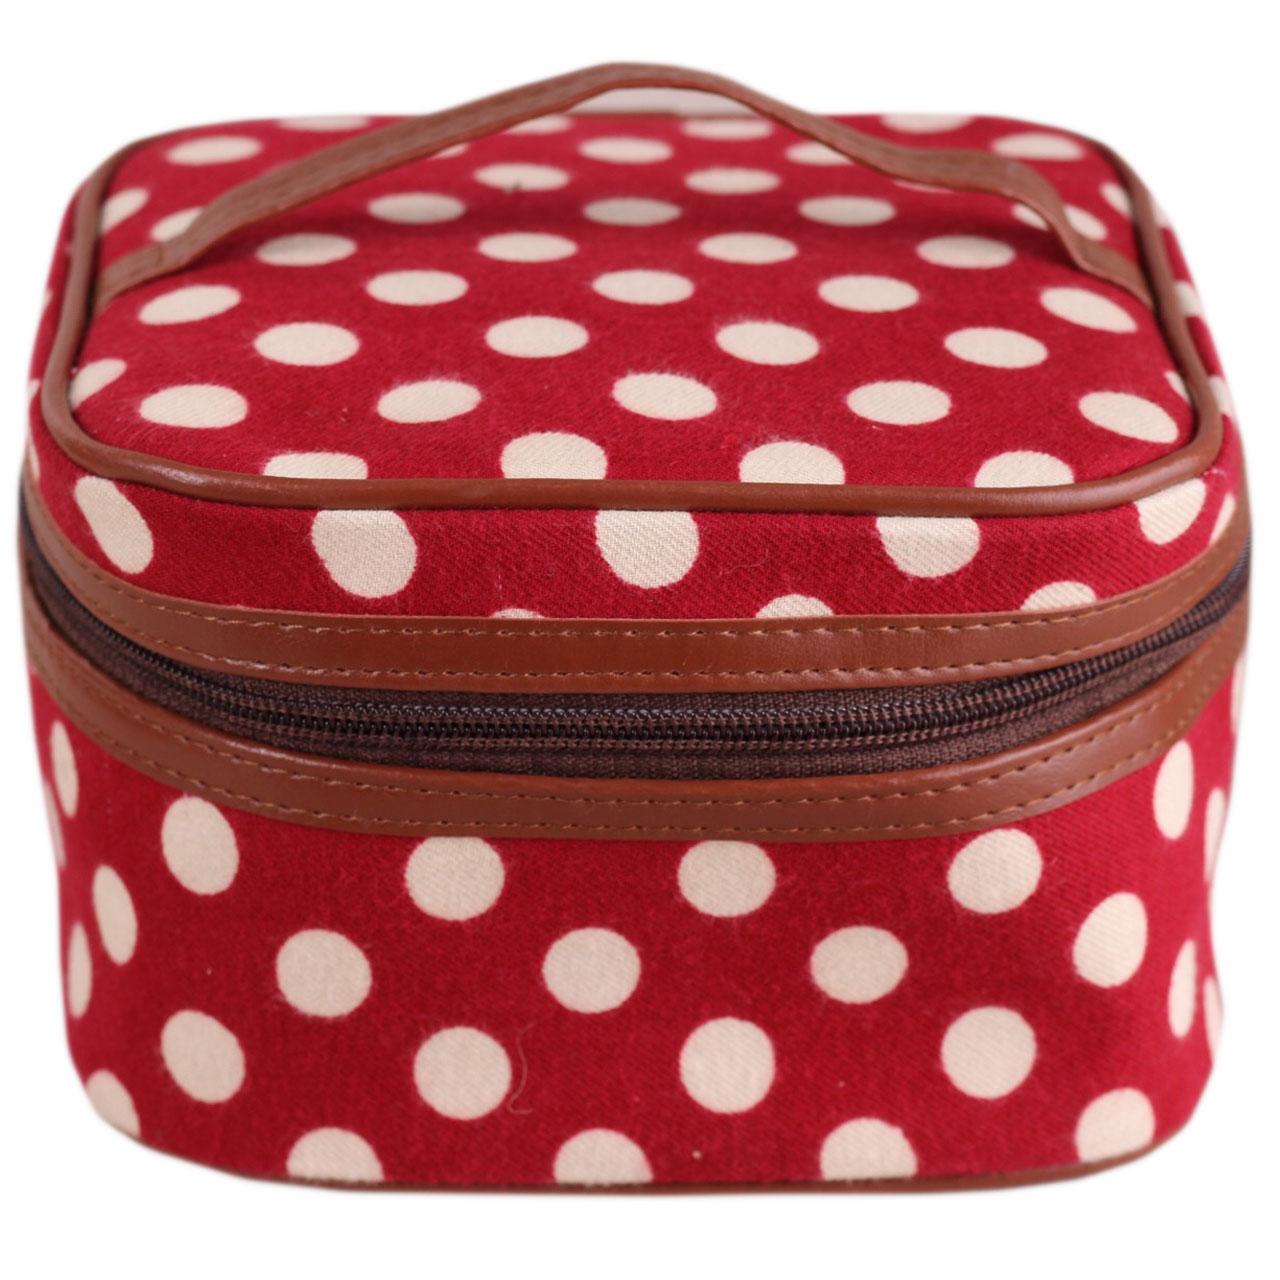 قیمت کیف لوازم آرایش هیاهو کد T10